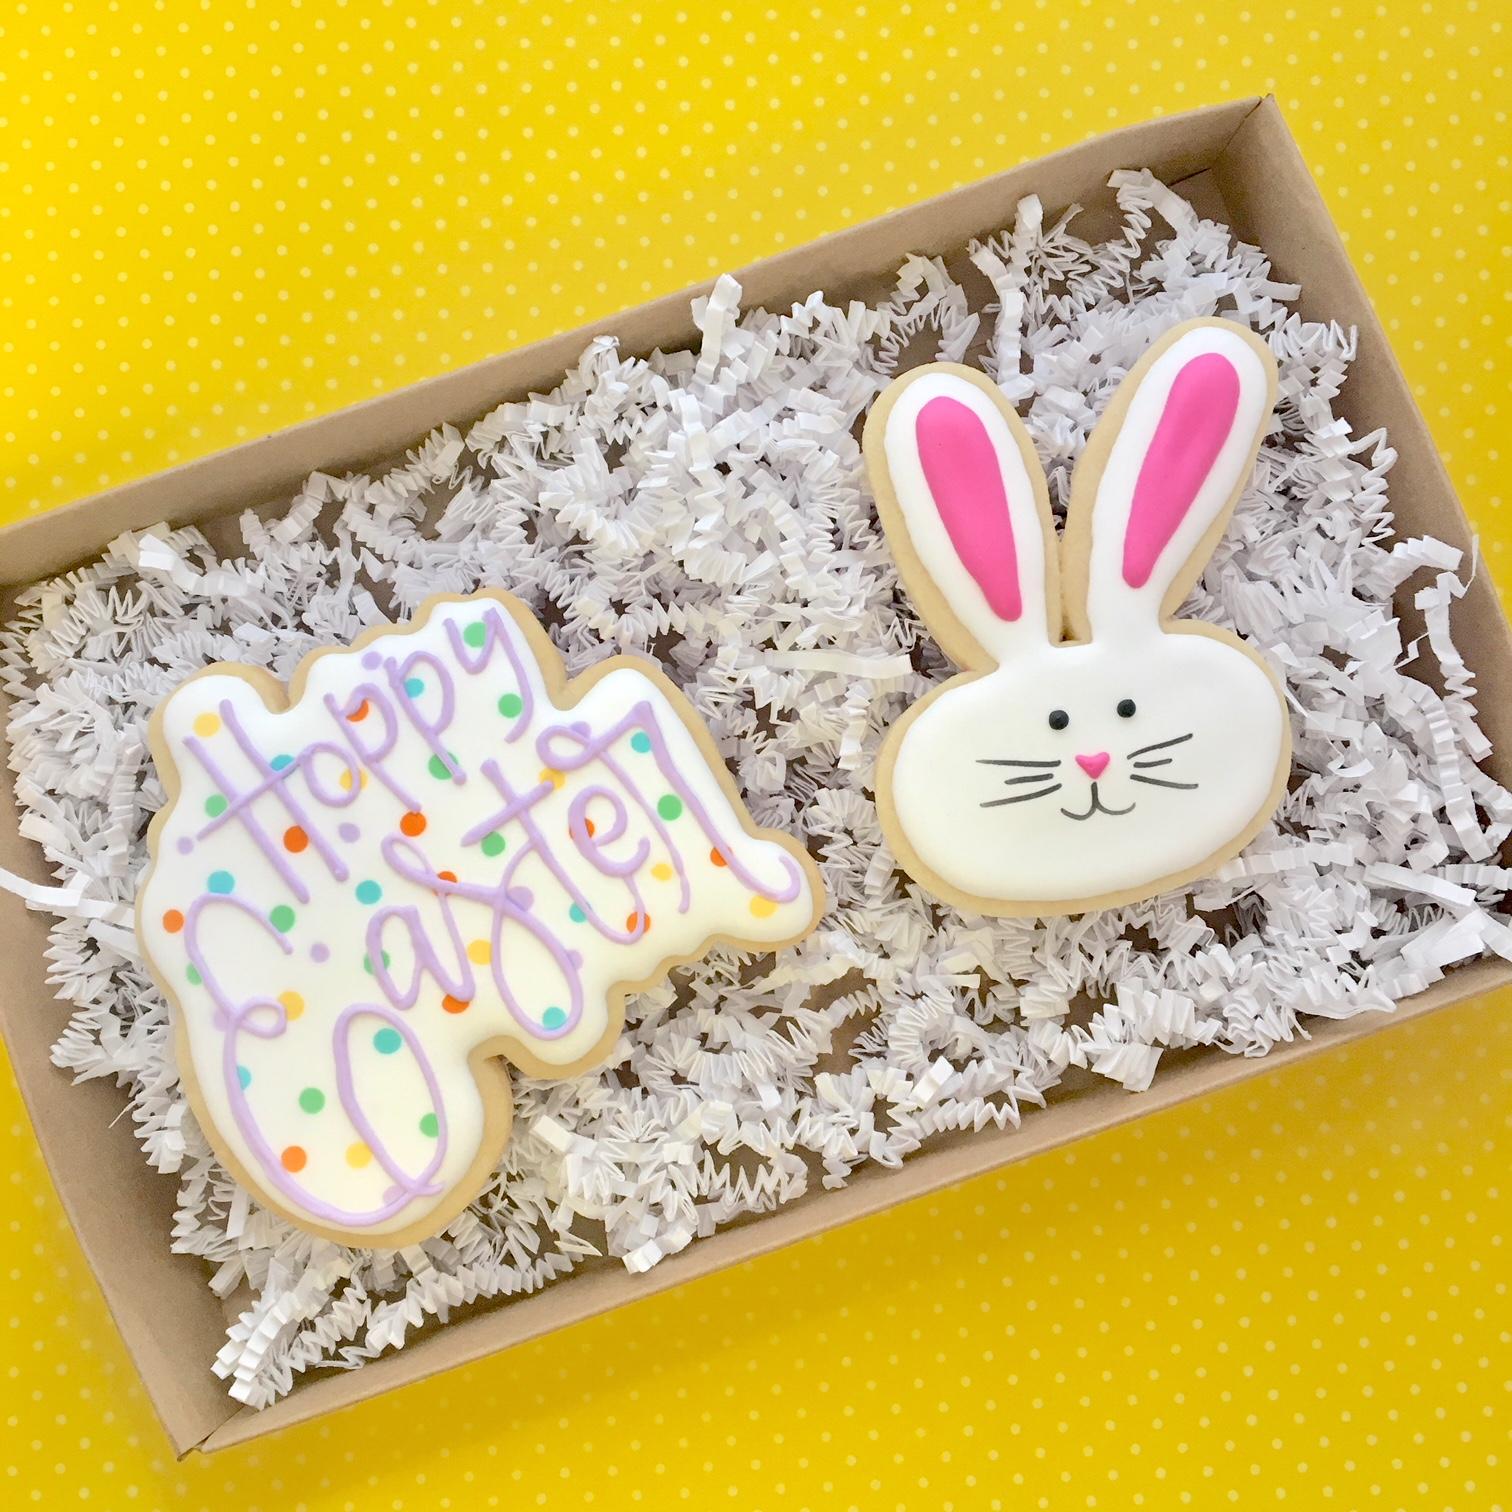 Custom Hoppy Easter Sugar Cookies 2-pack Gift Box